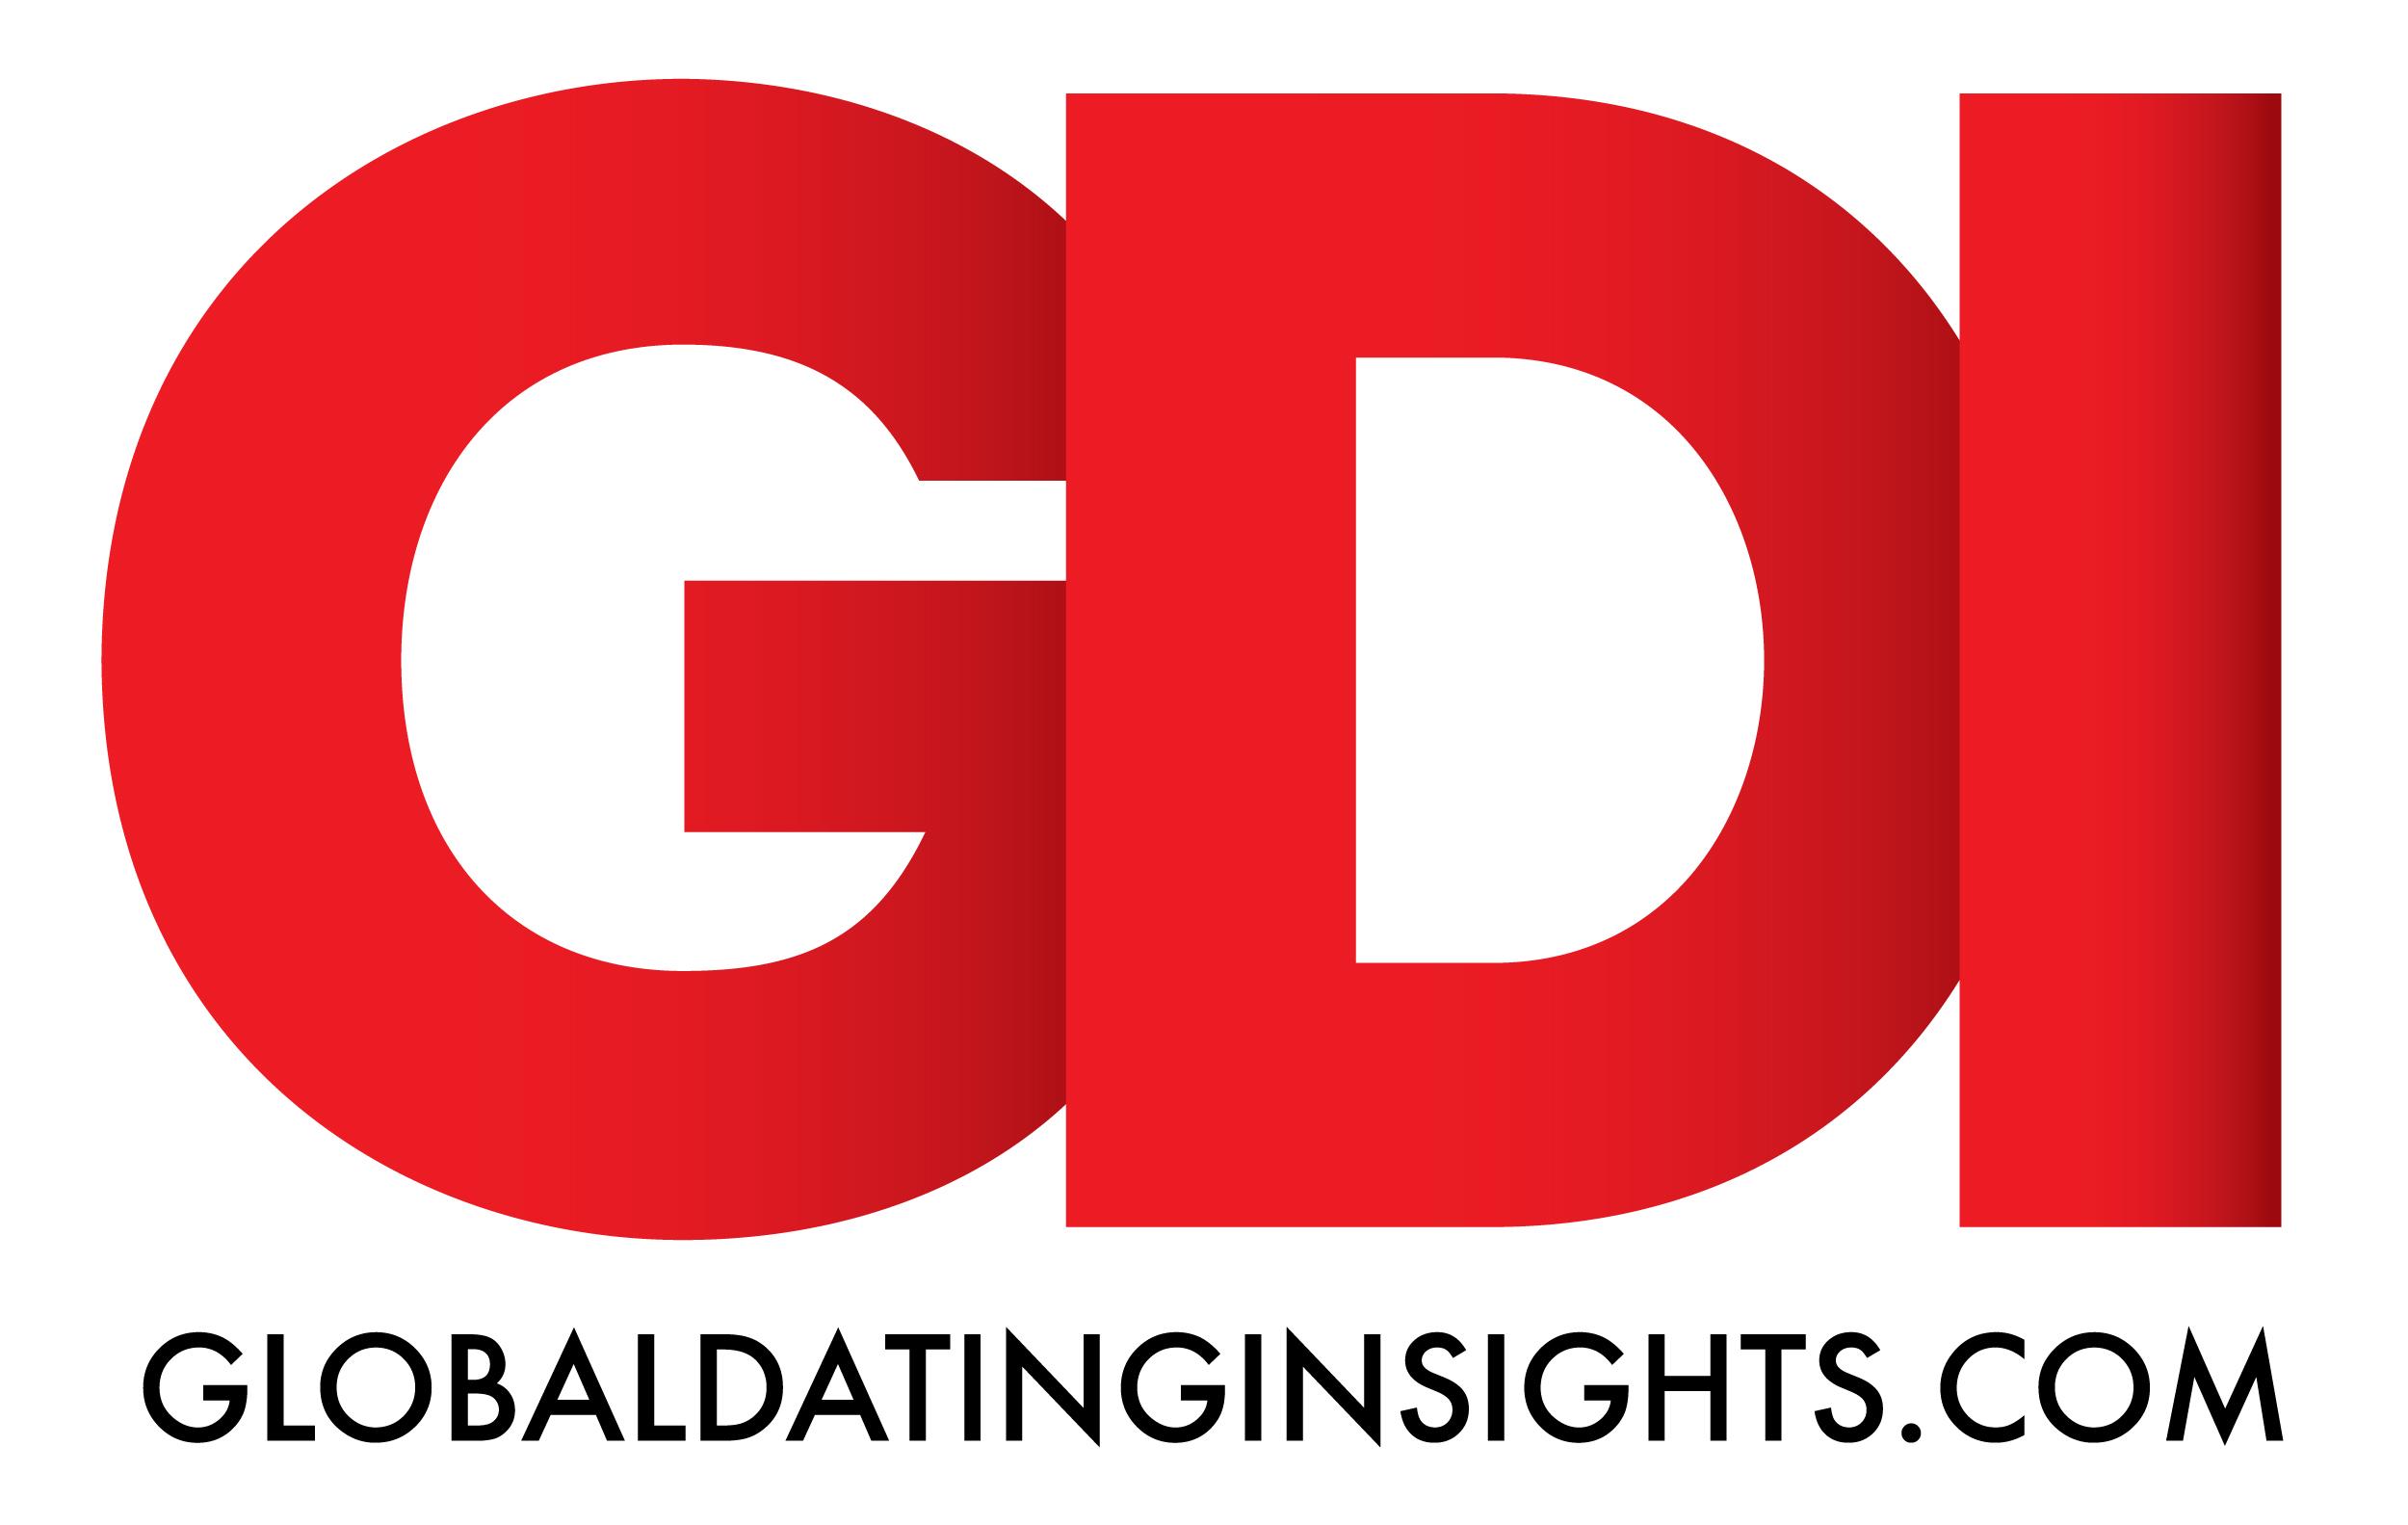 global-dating-insights-logo.jpg